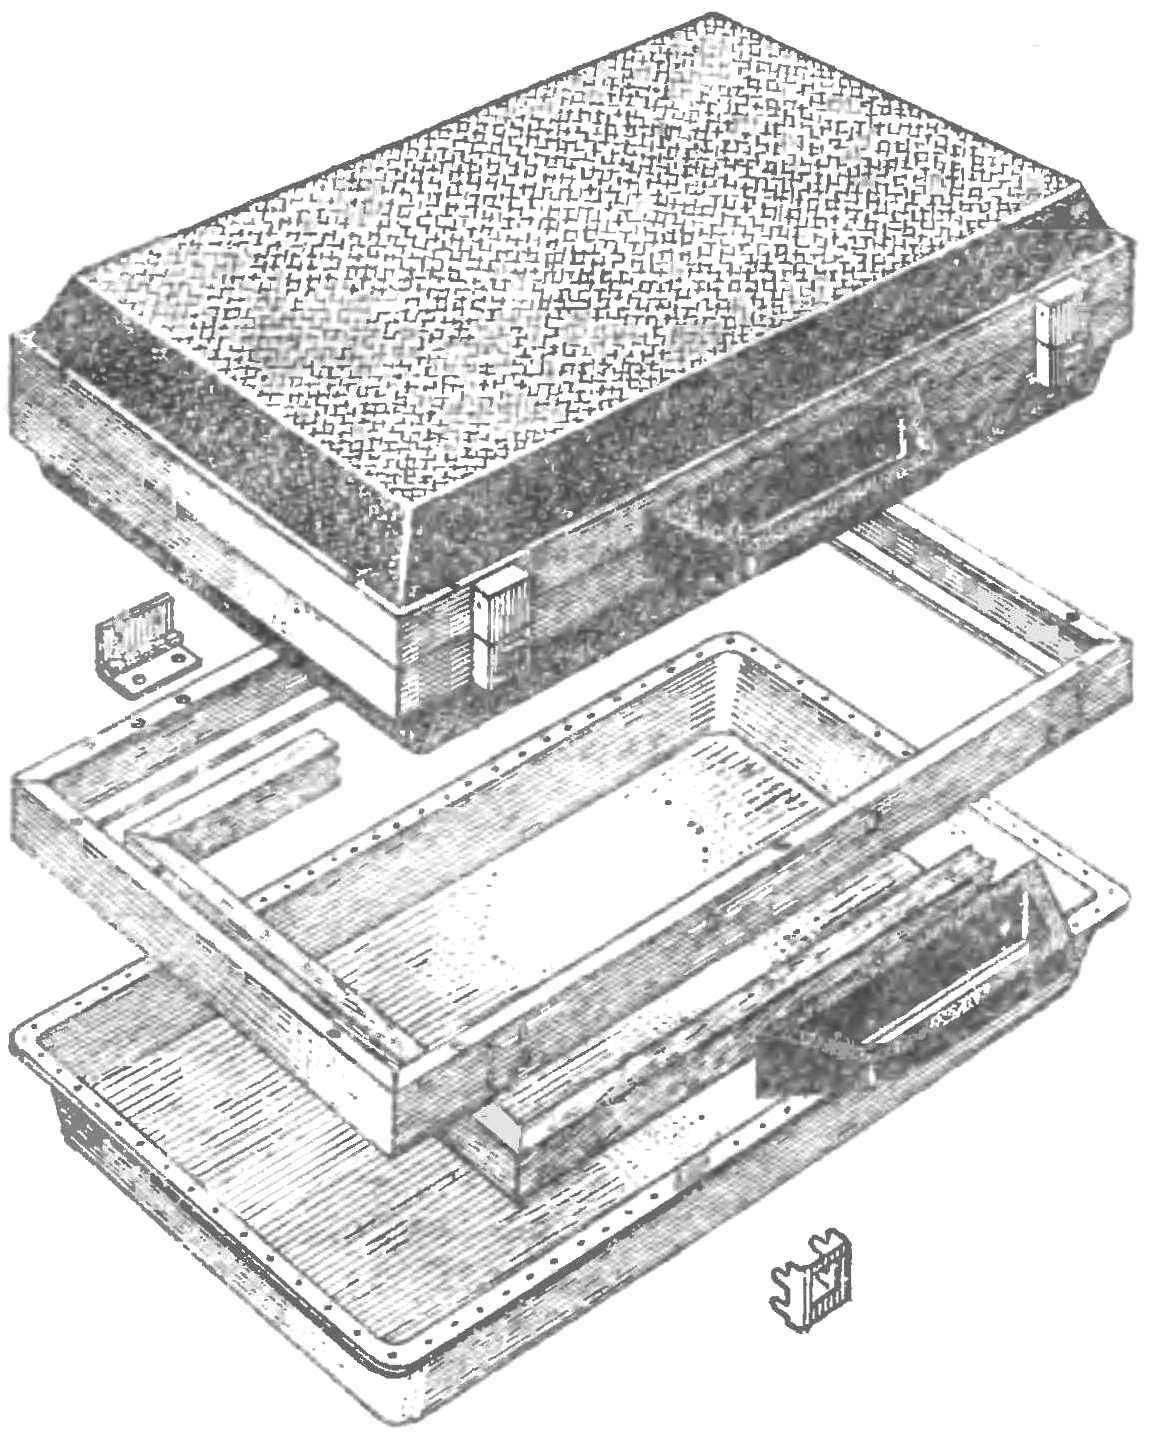 Fig. 4. Assembly polucarpus case (cladding not shown).